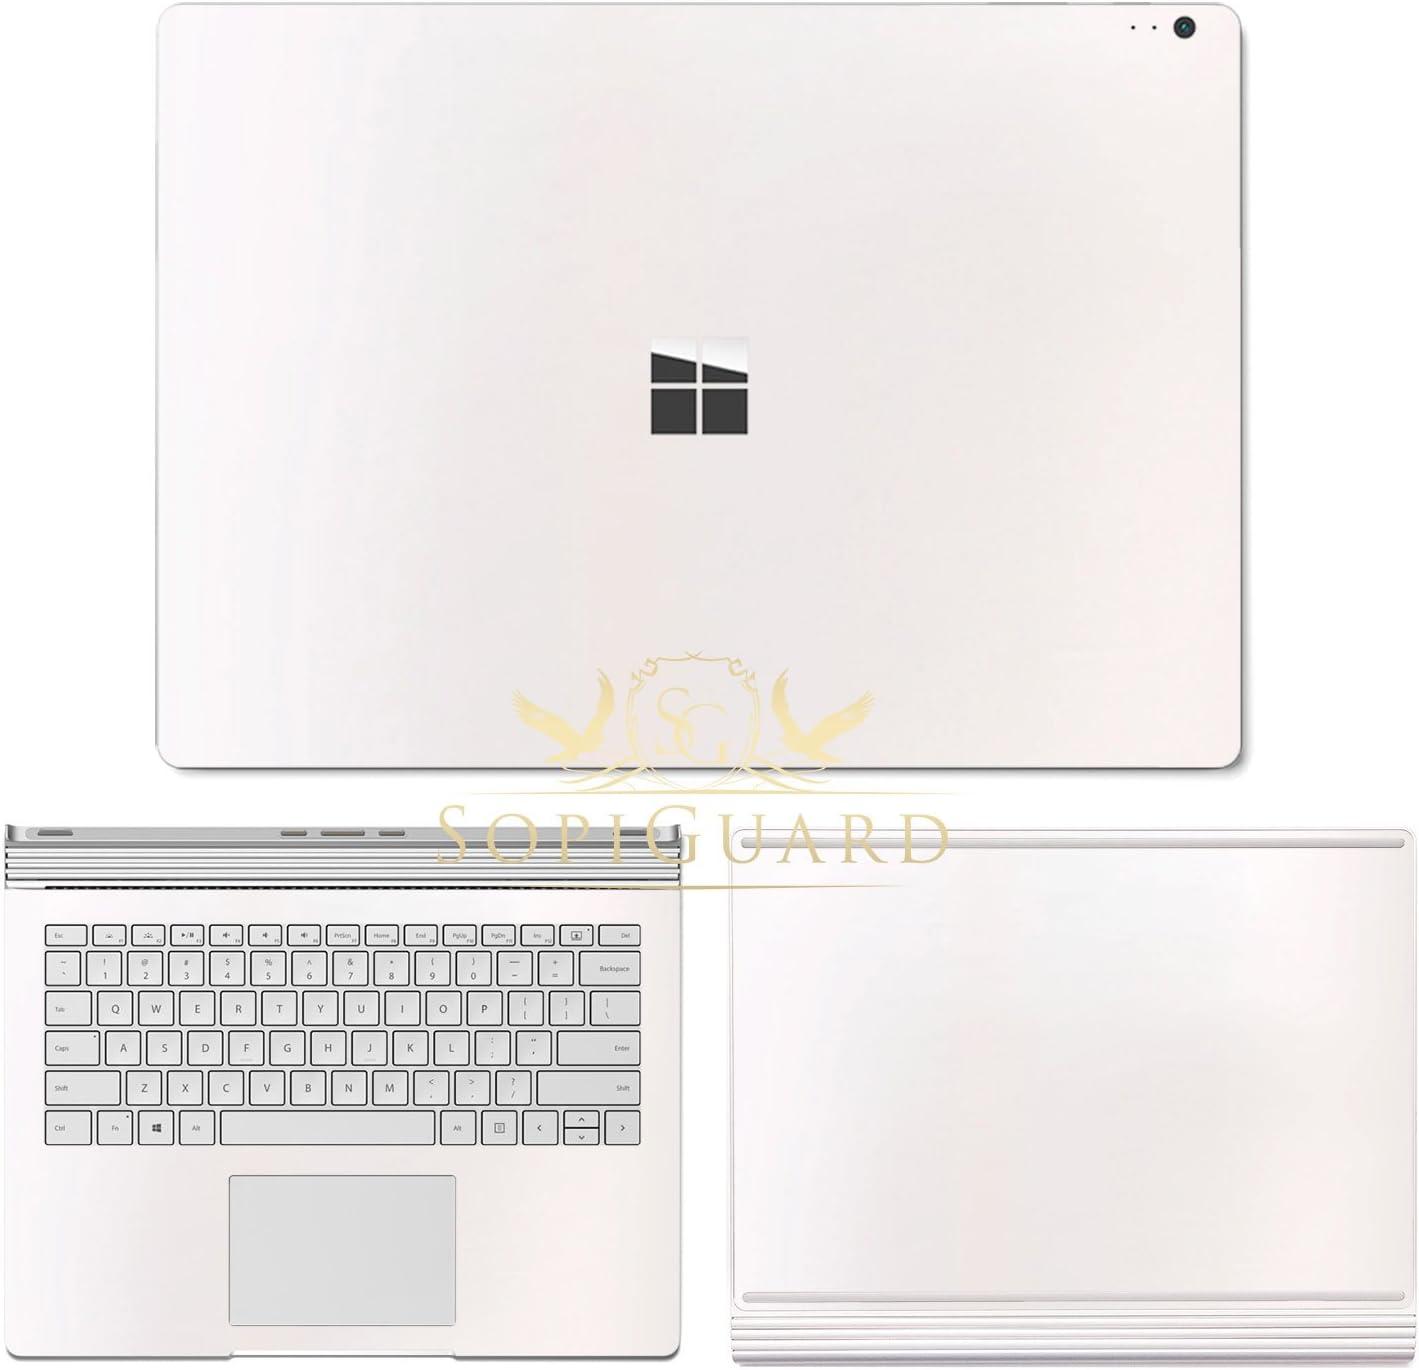 SopiGuard 5 ☆ popular Microsoft Surface Book New mail order 2 Precision 15